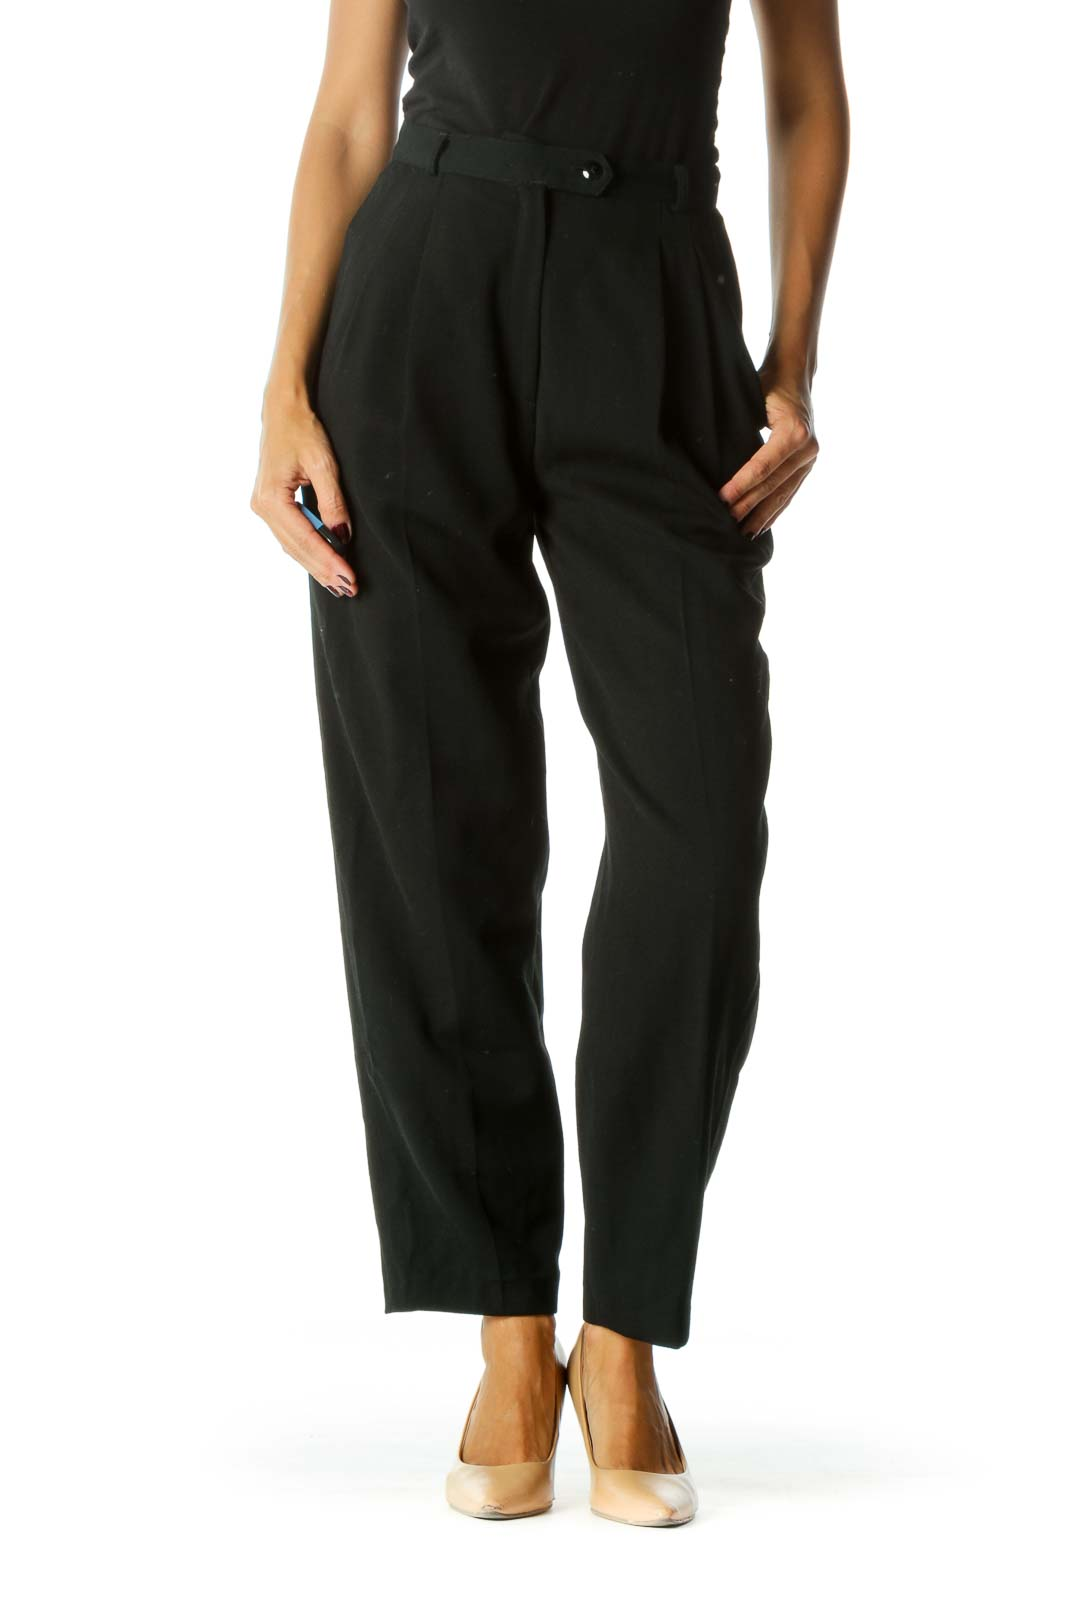 Black 100% Wool Designer High-Waisted Pants Front